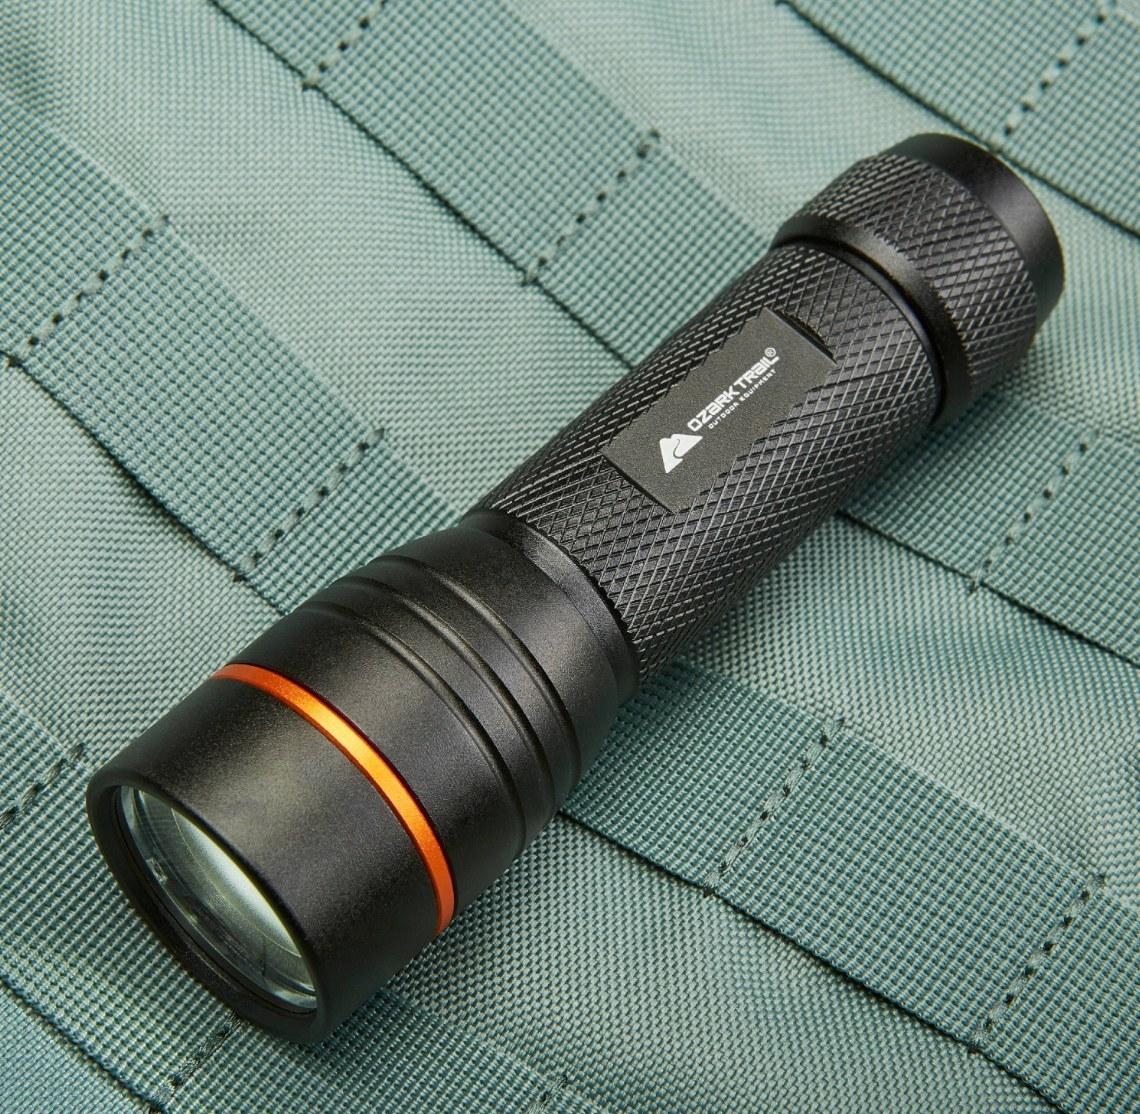 The LED flashlight in black